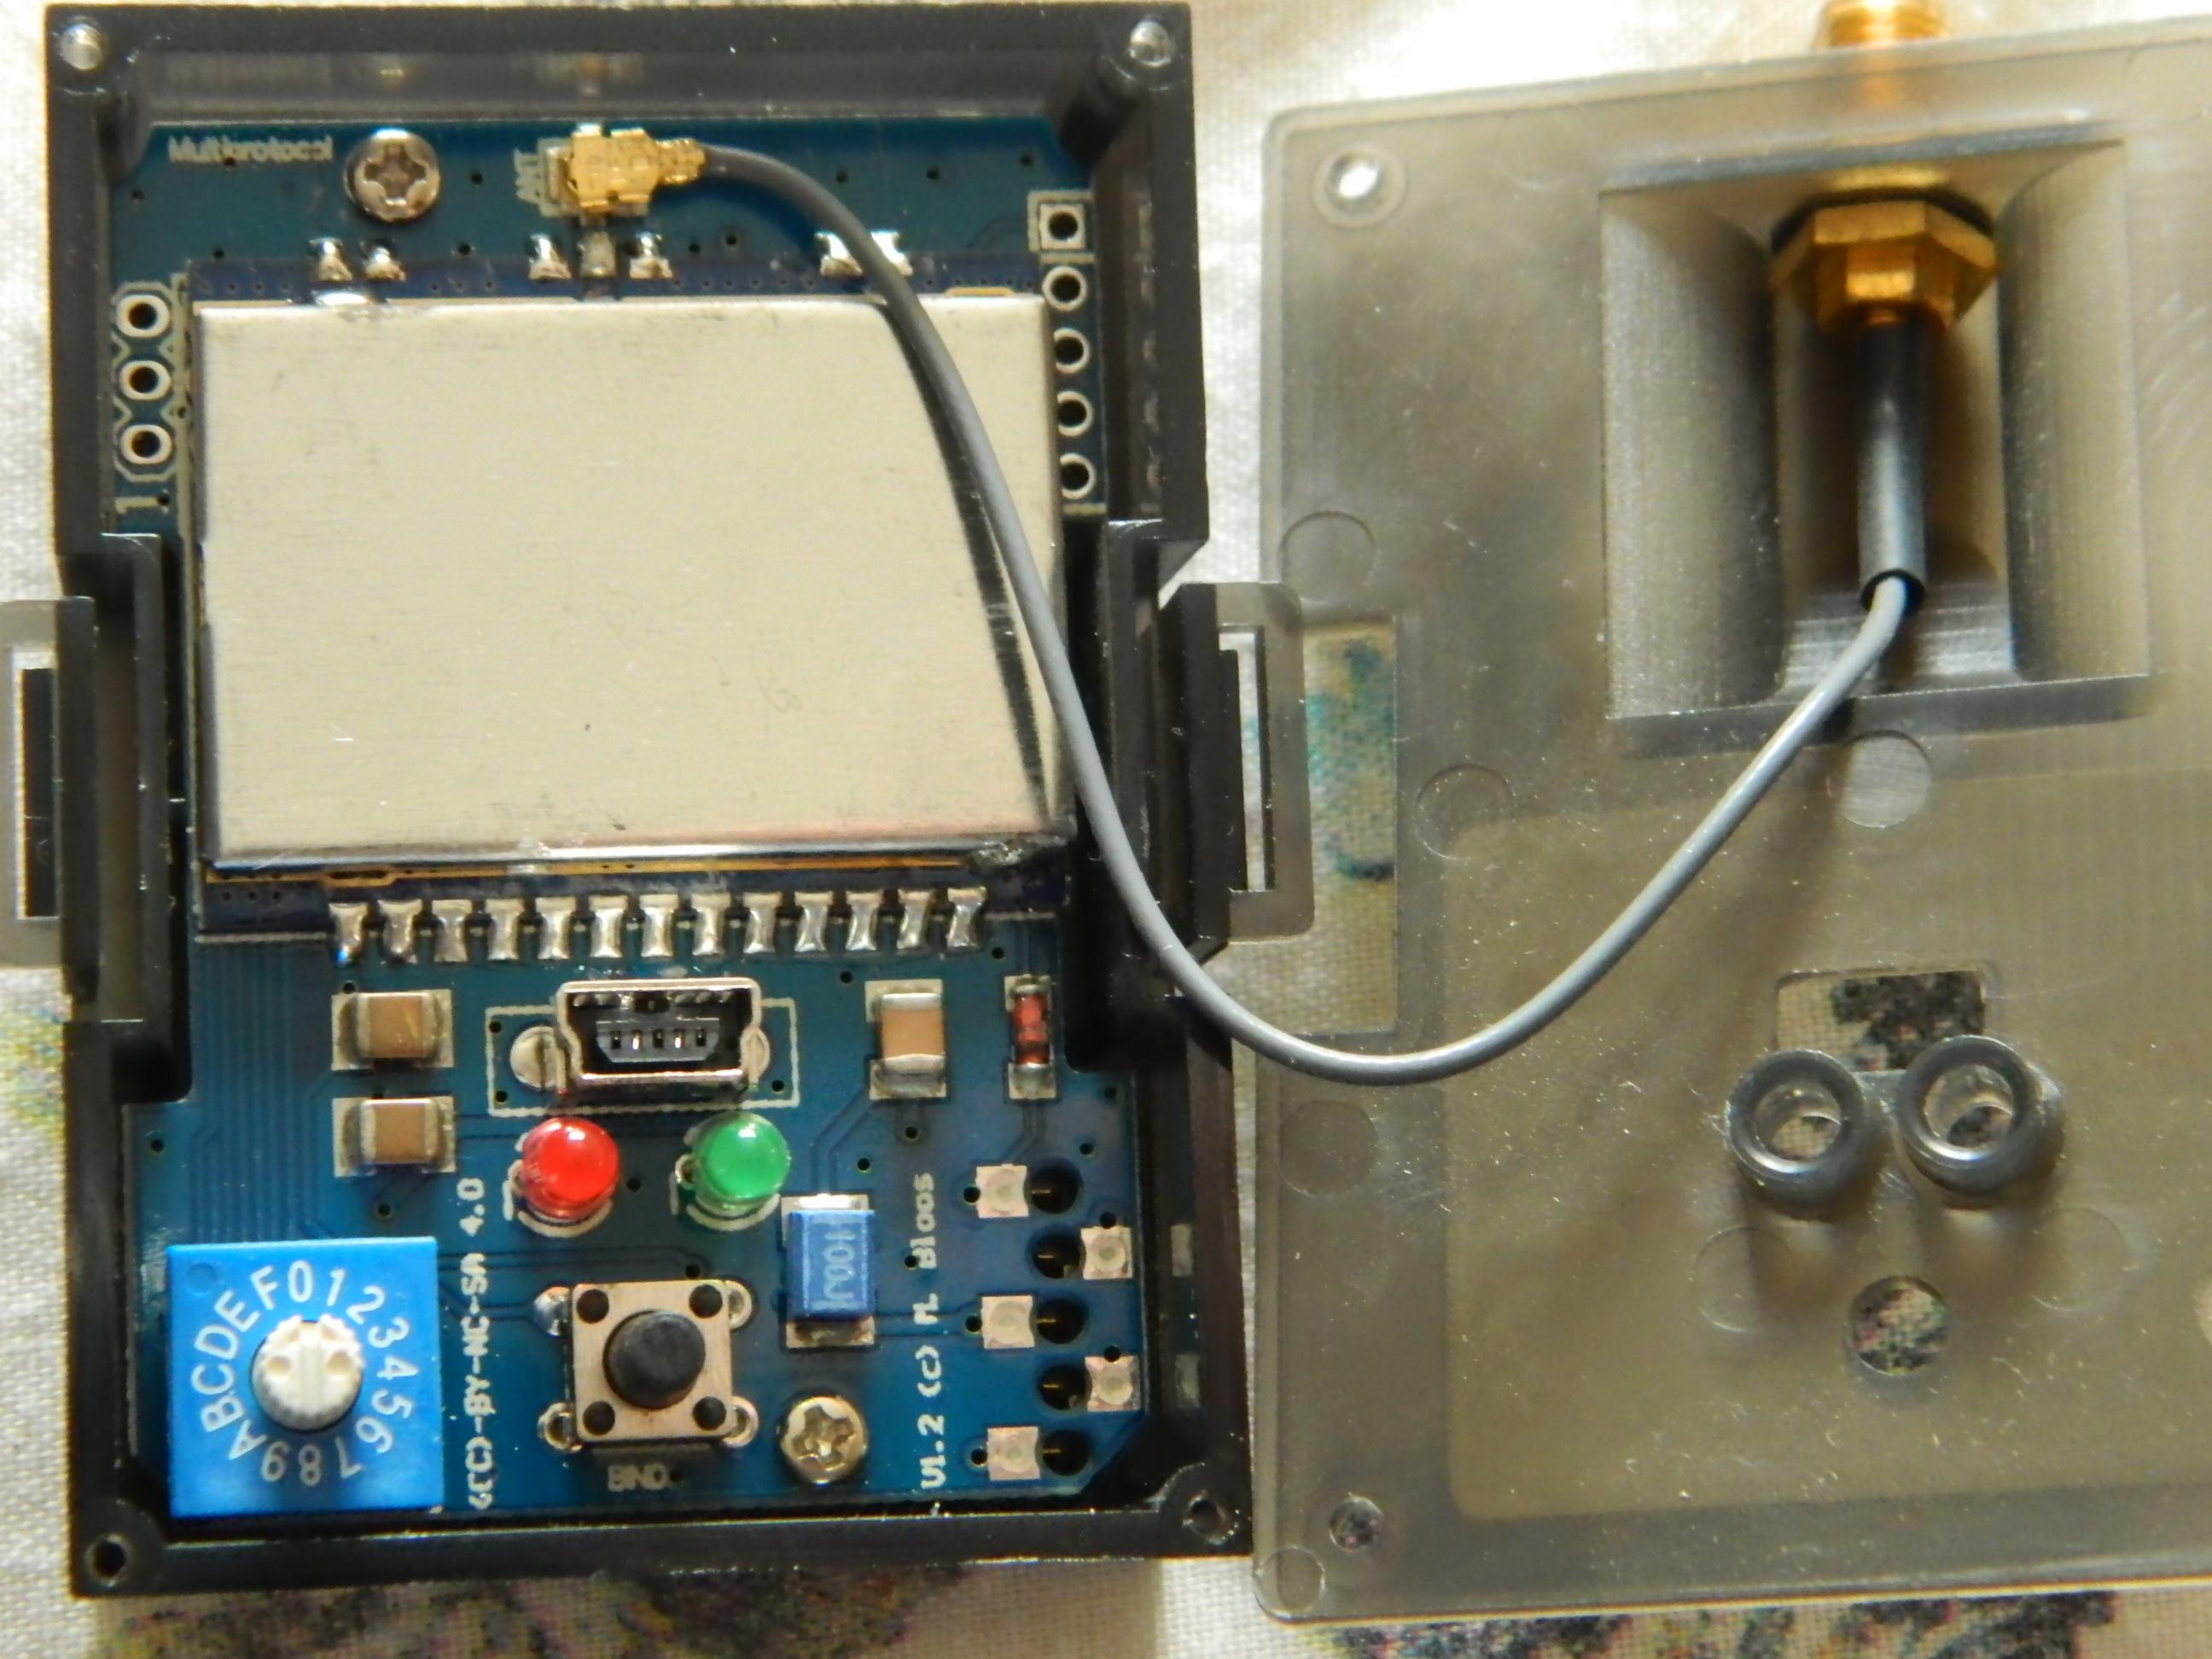 Jumper T12 OpenTX 16CH Radio Transmitter for Frsky JR Flysky -- Free